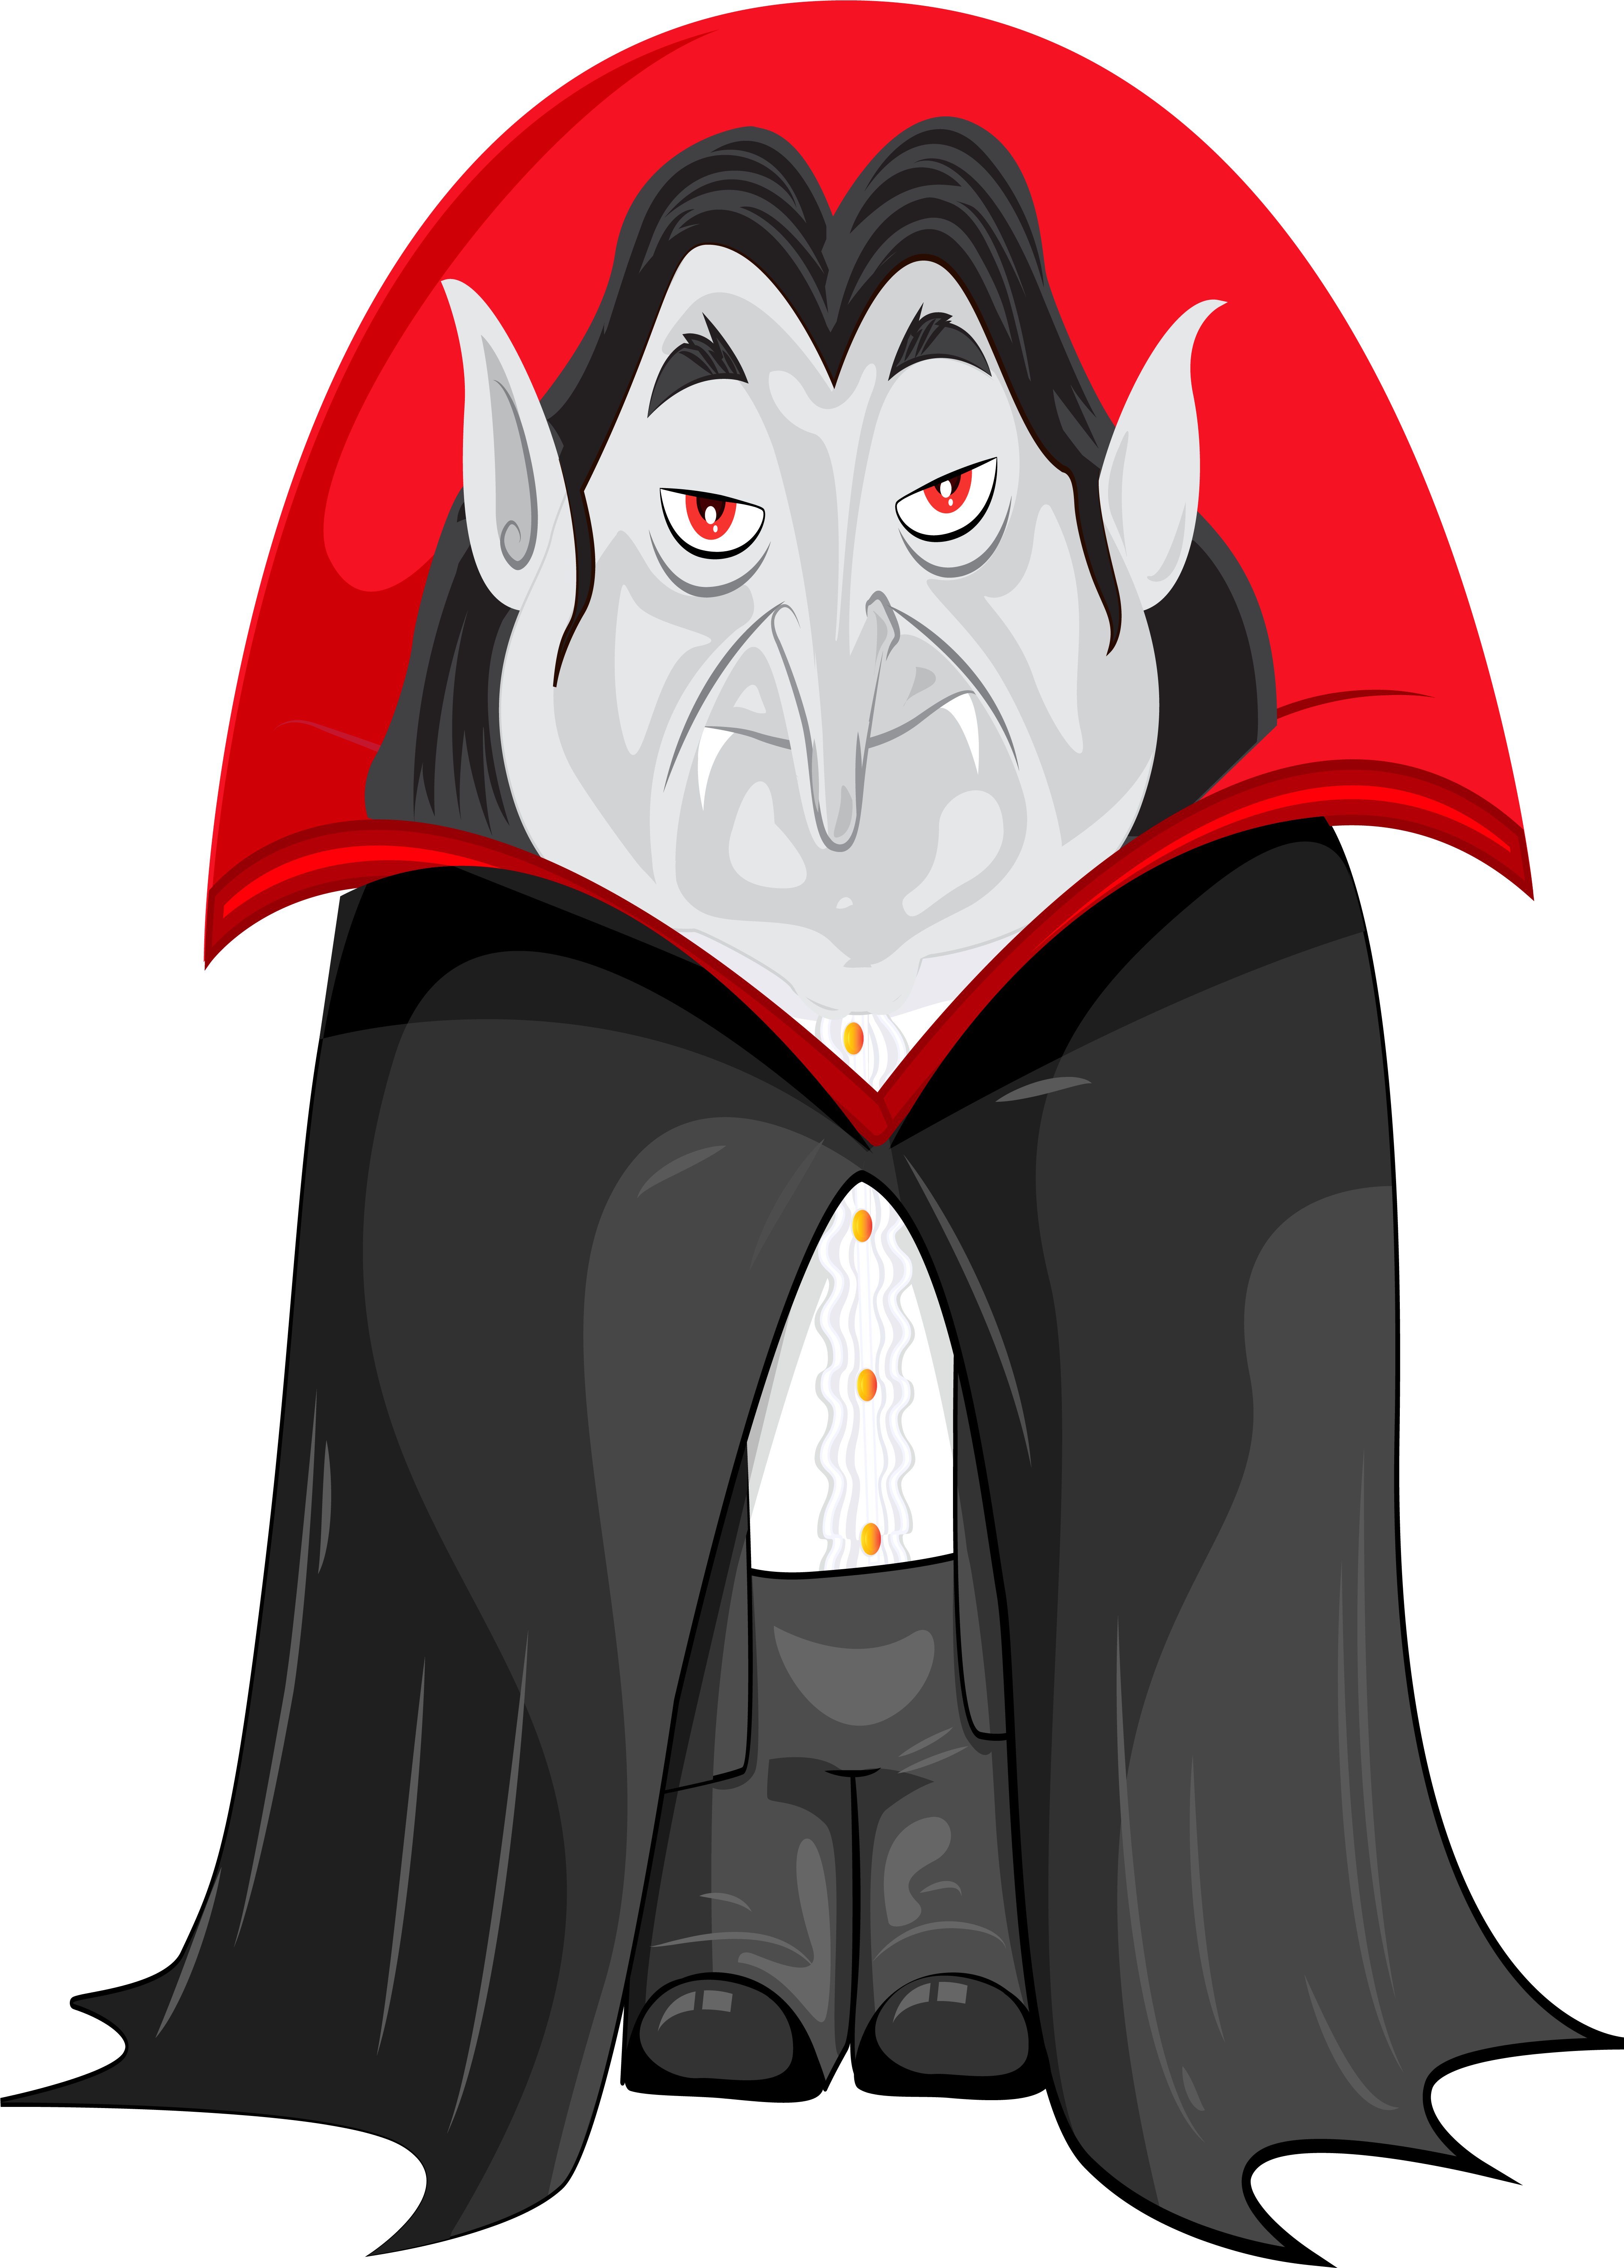 Dracula clipart transparent. Vampire coffin halloween png